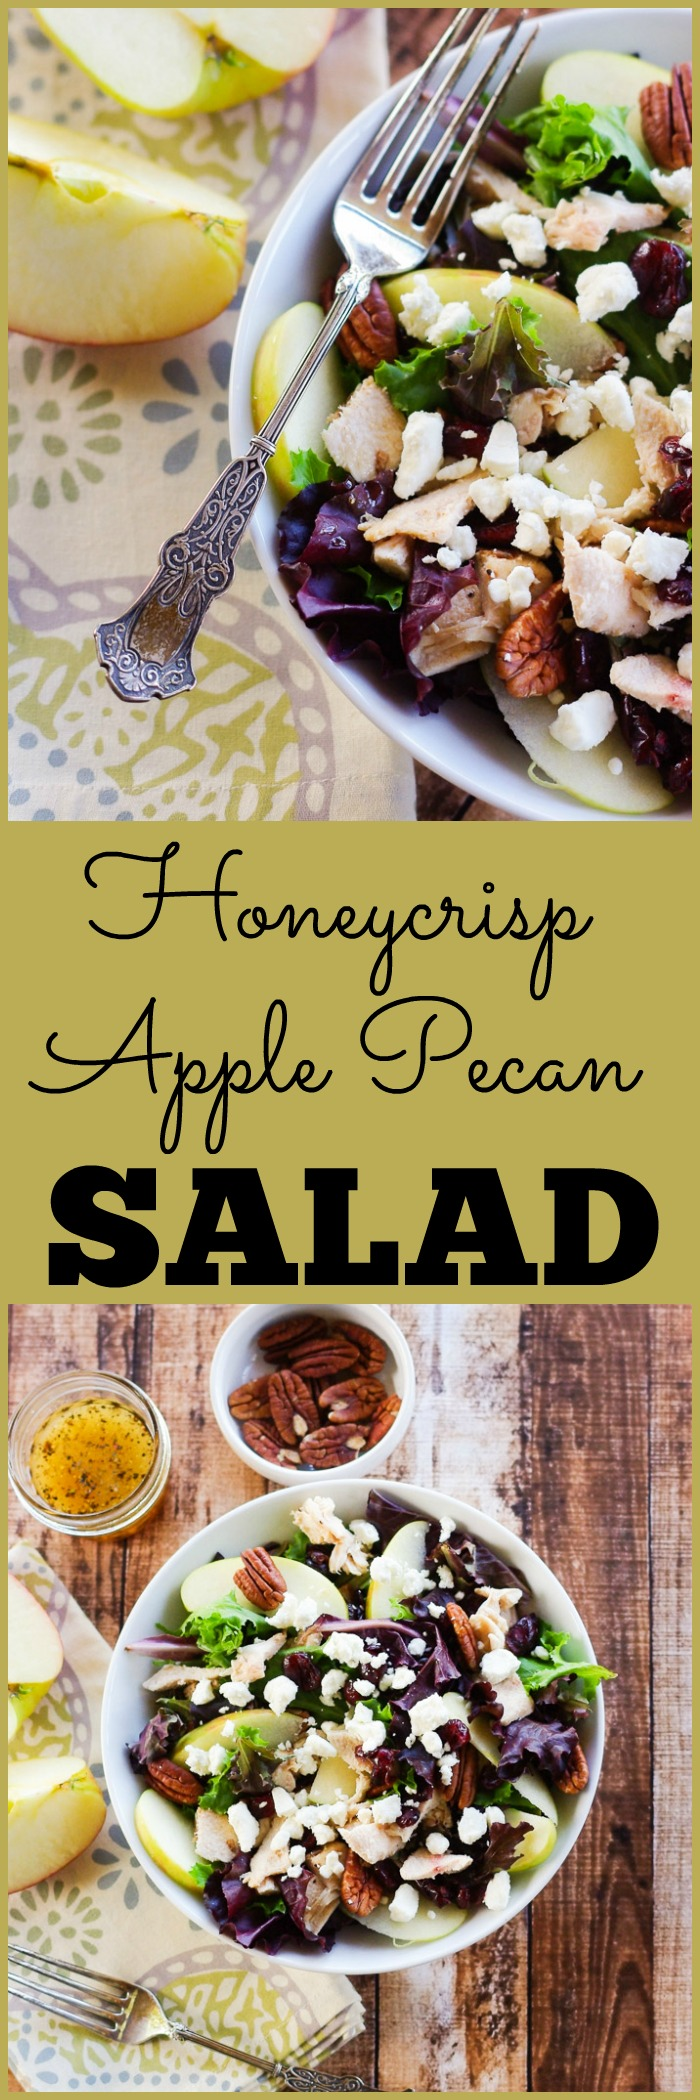 Honeycrisp Apple Pecan Salad with an Apple Cider Vinaigrette — Home ...